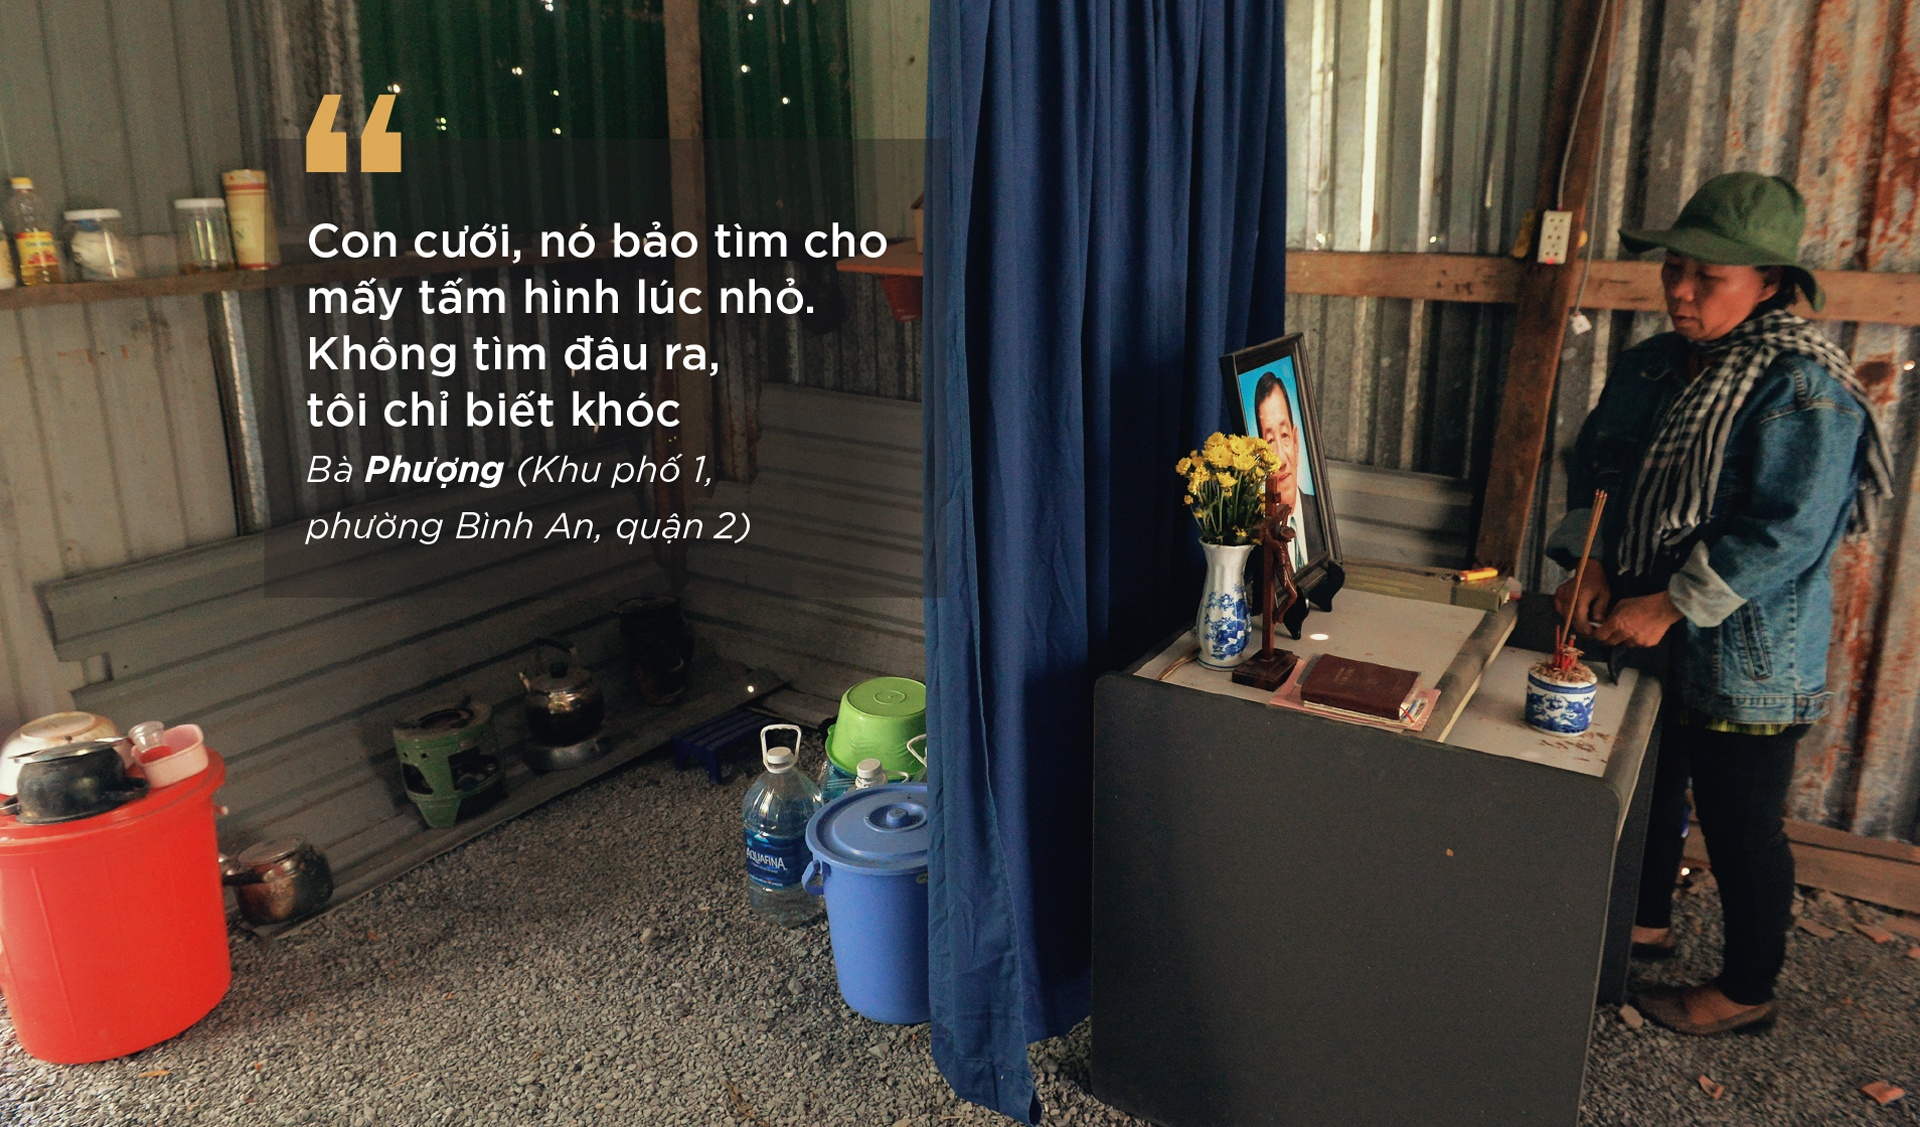 20 nam sau quy hoach, nguoi dan Thu Thiem song trong co han, tam toi hinh anh 6